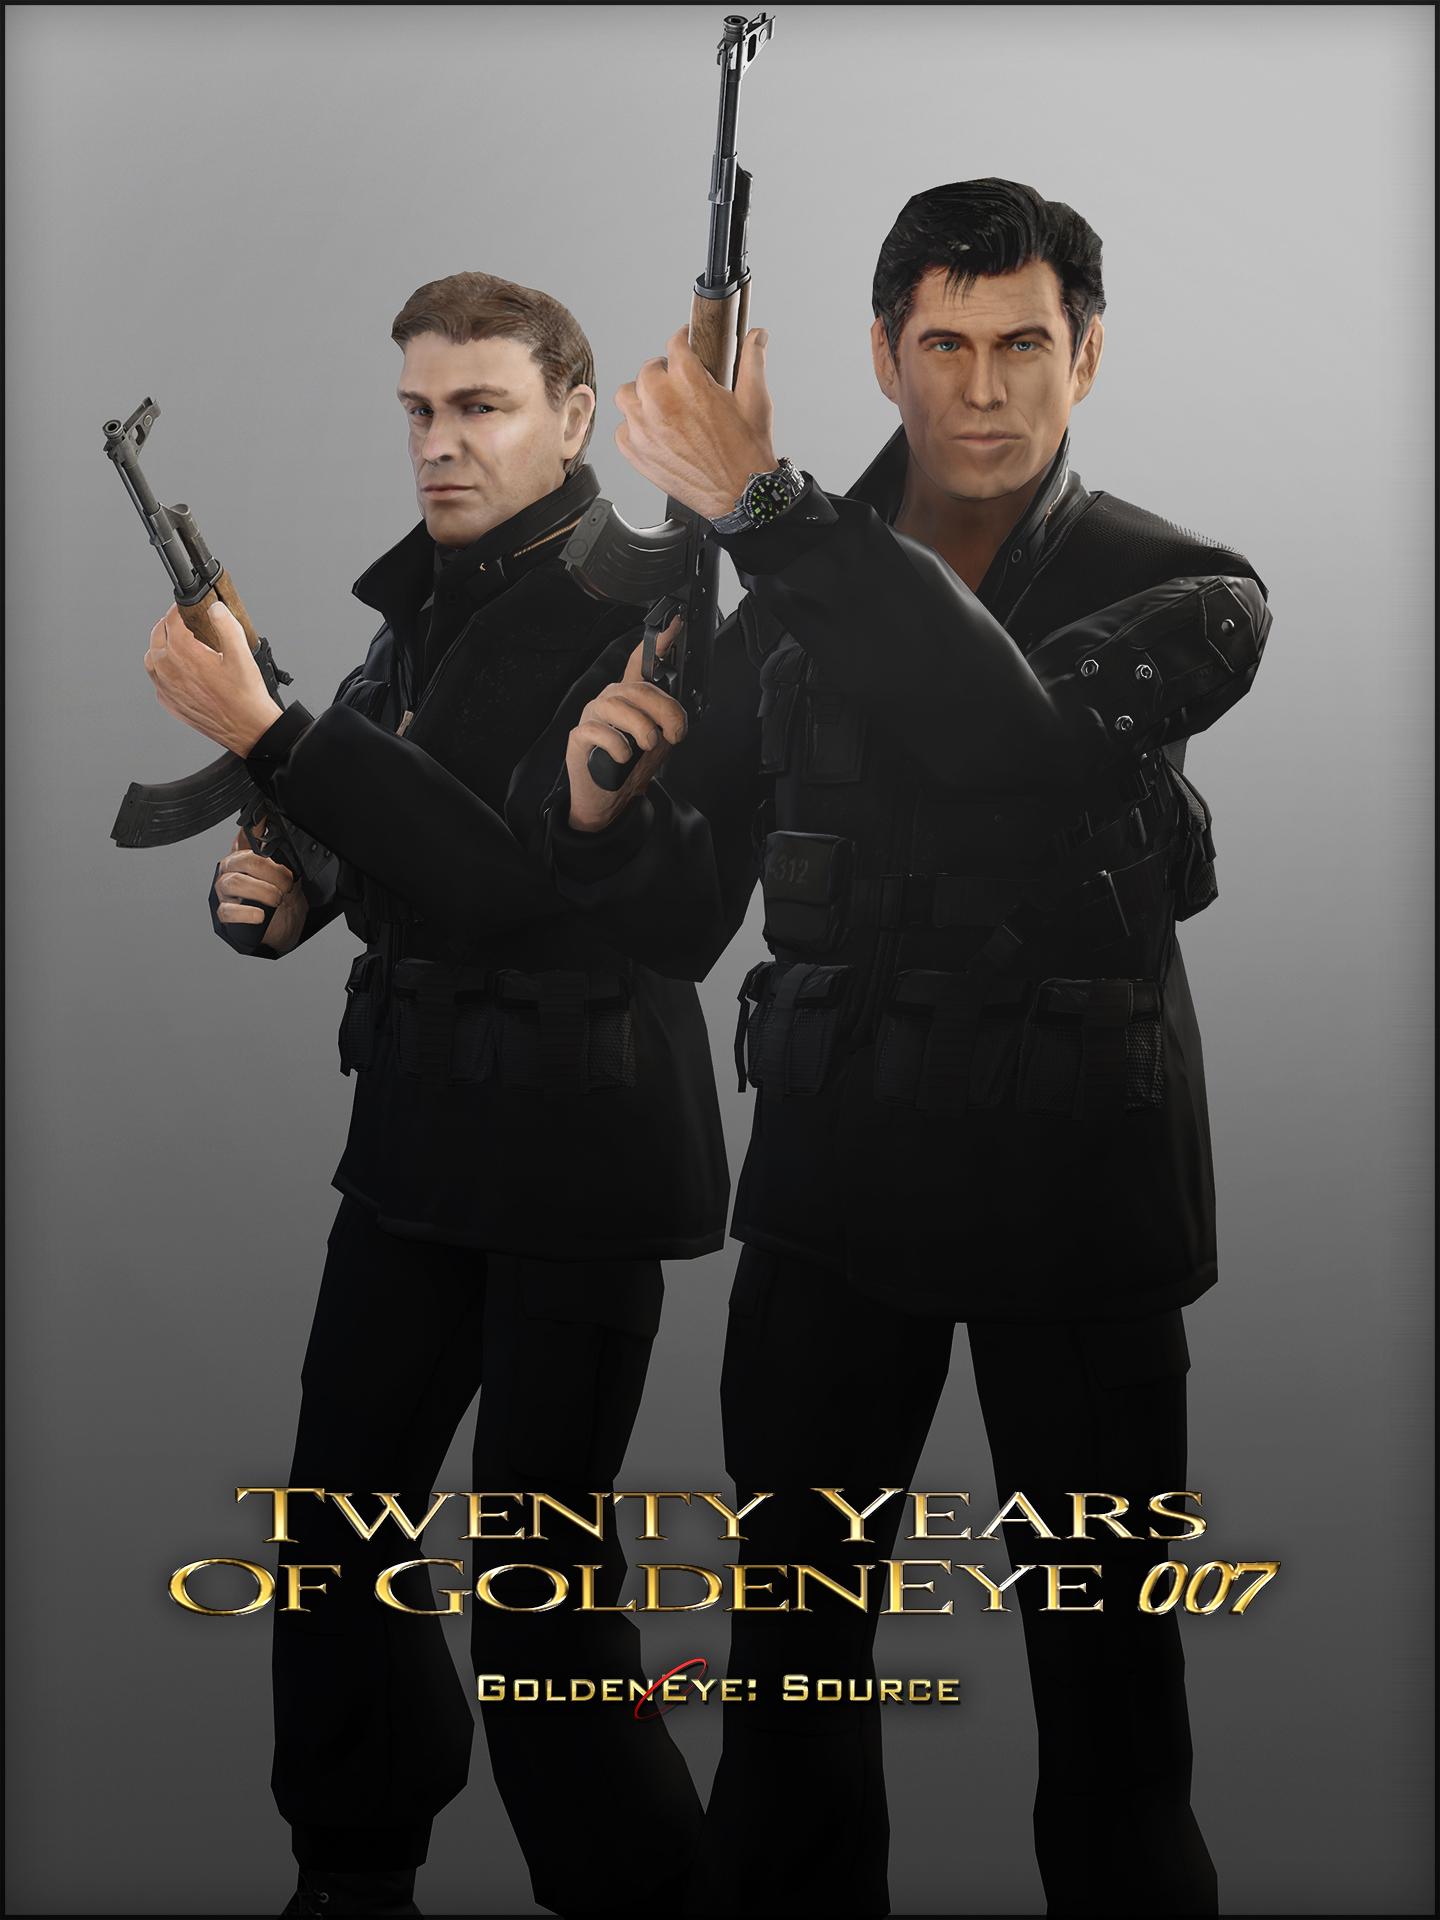 GoldenEye 007 Poster recreation